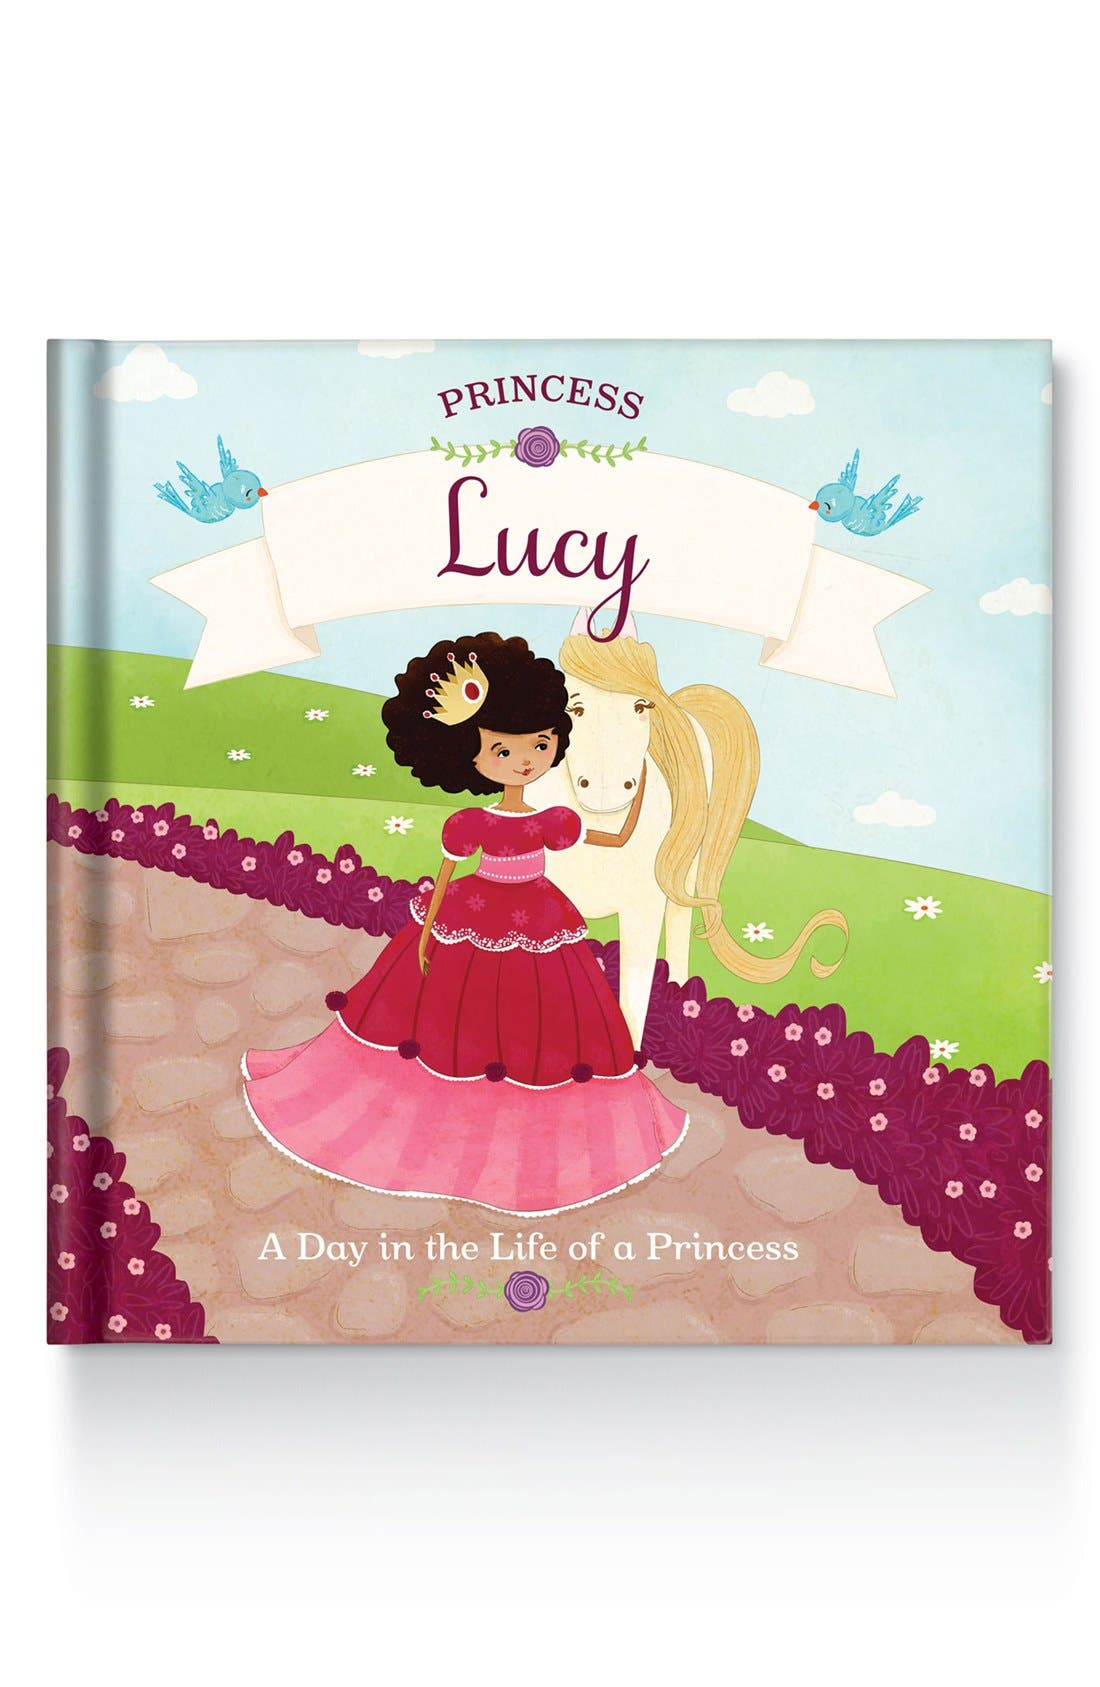 'Princess' Personalized Book,                             Main thumbnail 1, color,                             200